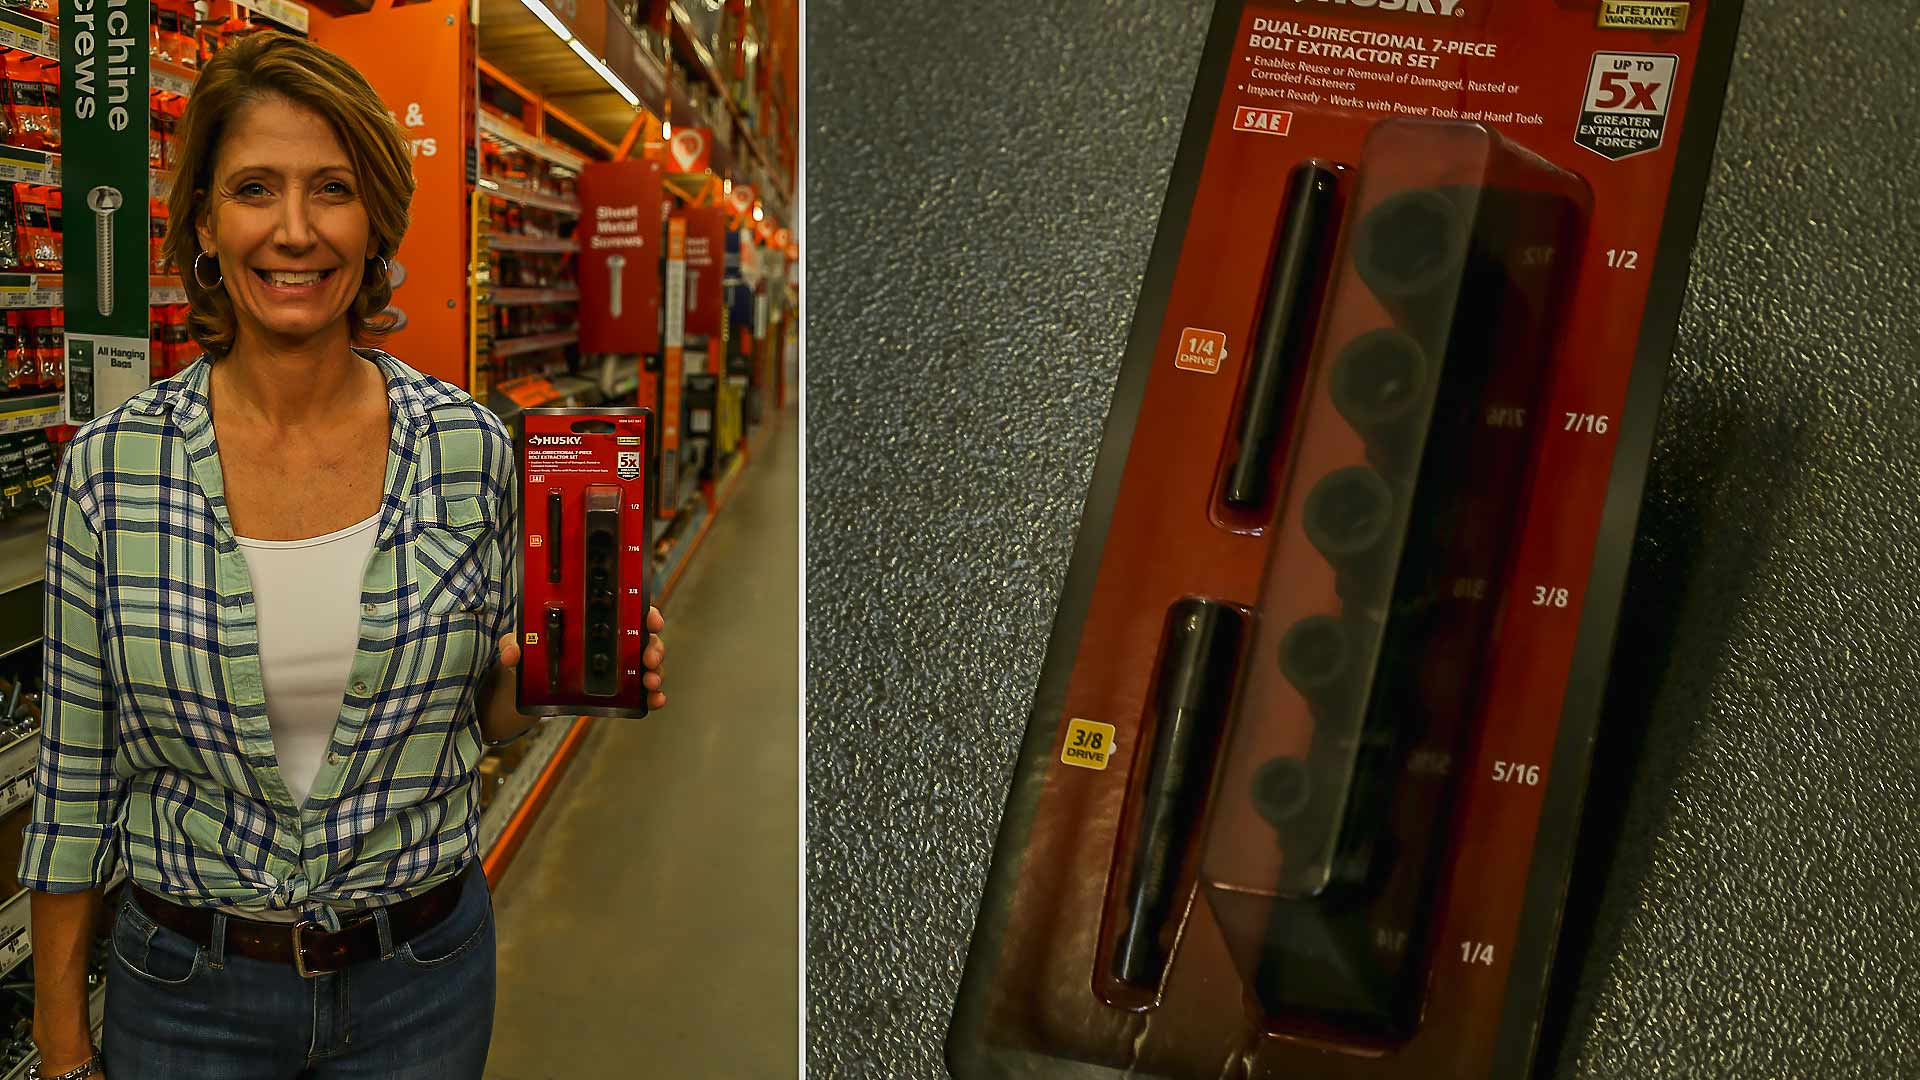 Jodi Marks displaying husky bolt extractor set at Home Depot